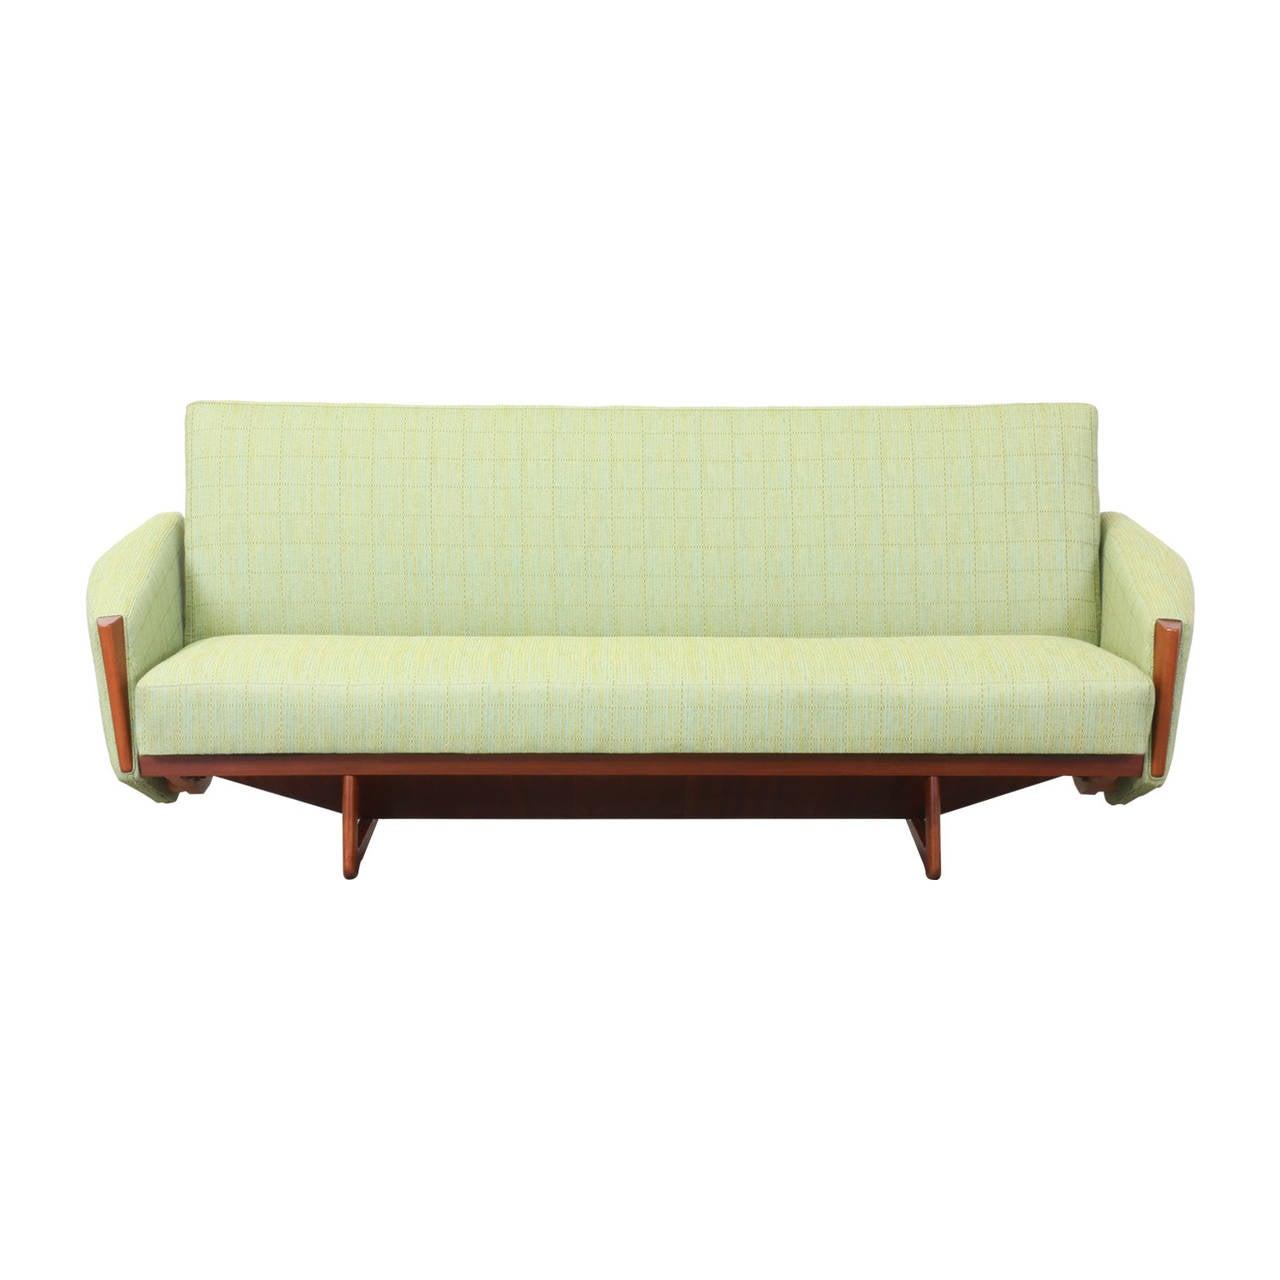 danish modern sofa bed sectional crate and barrel teak at 1stdibs